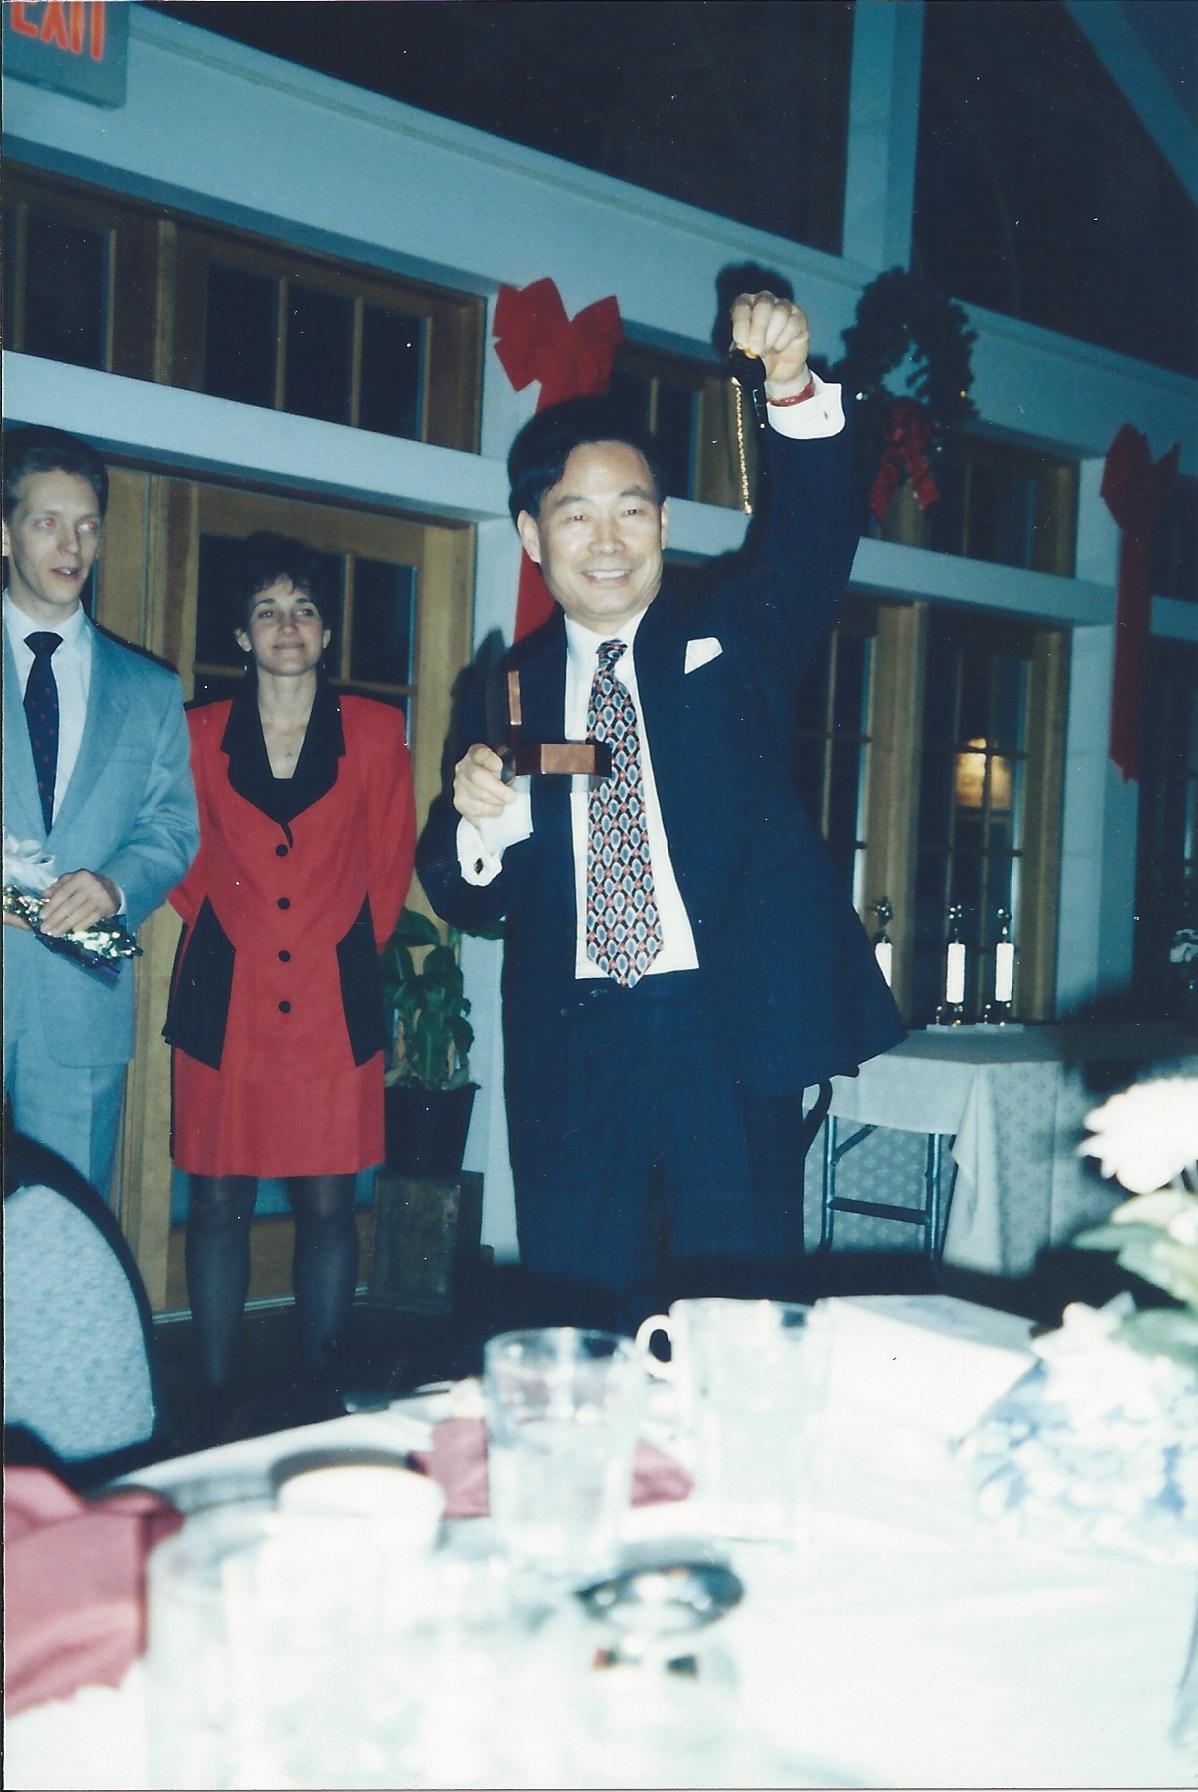 0350 Banquet Mr. Lee holding his pocketwatch.jpg